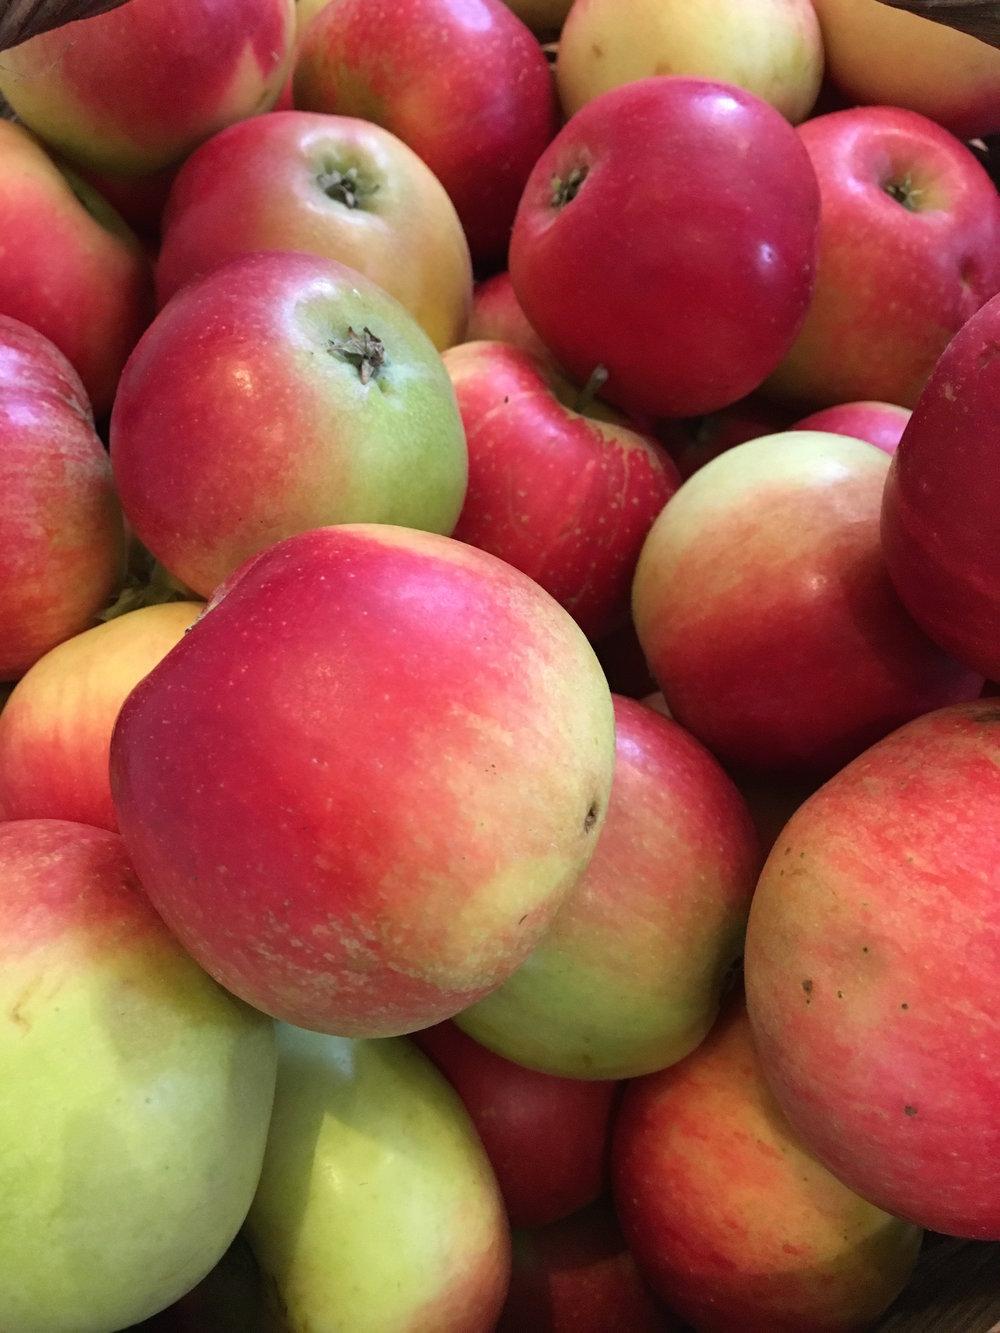 Apple Day 2017